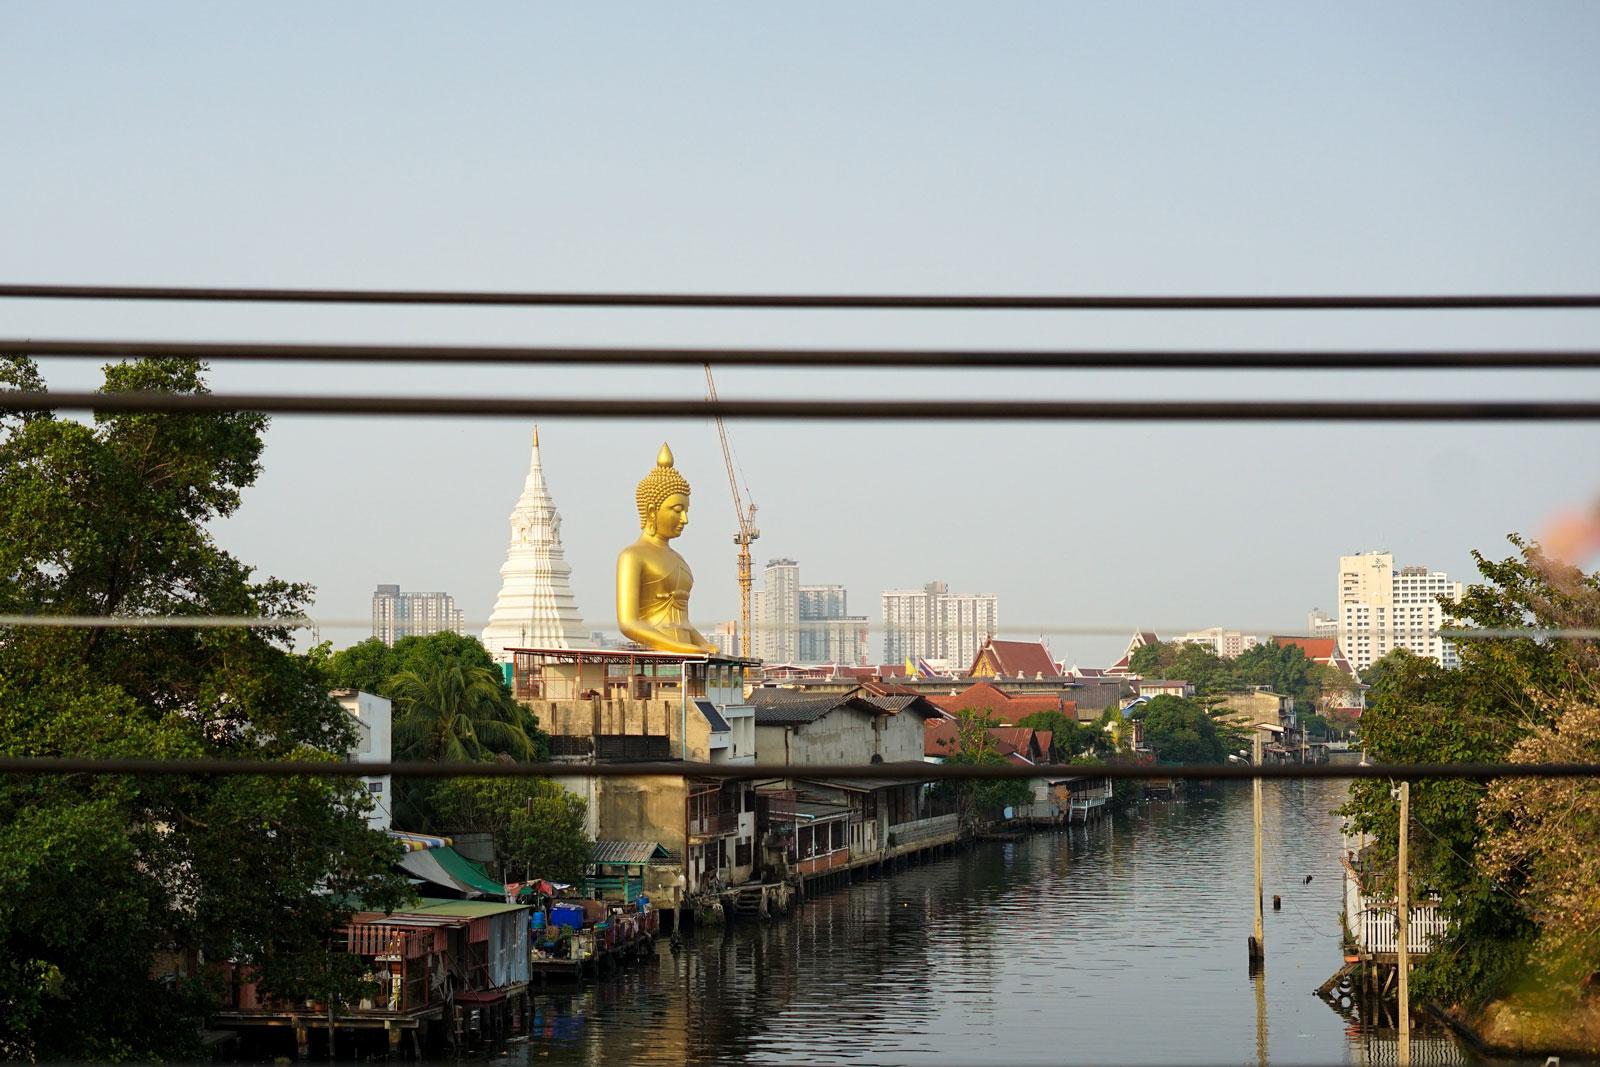 [Photos] Inside Bangkok's life-sustaining temple communities